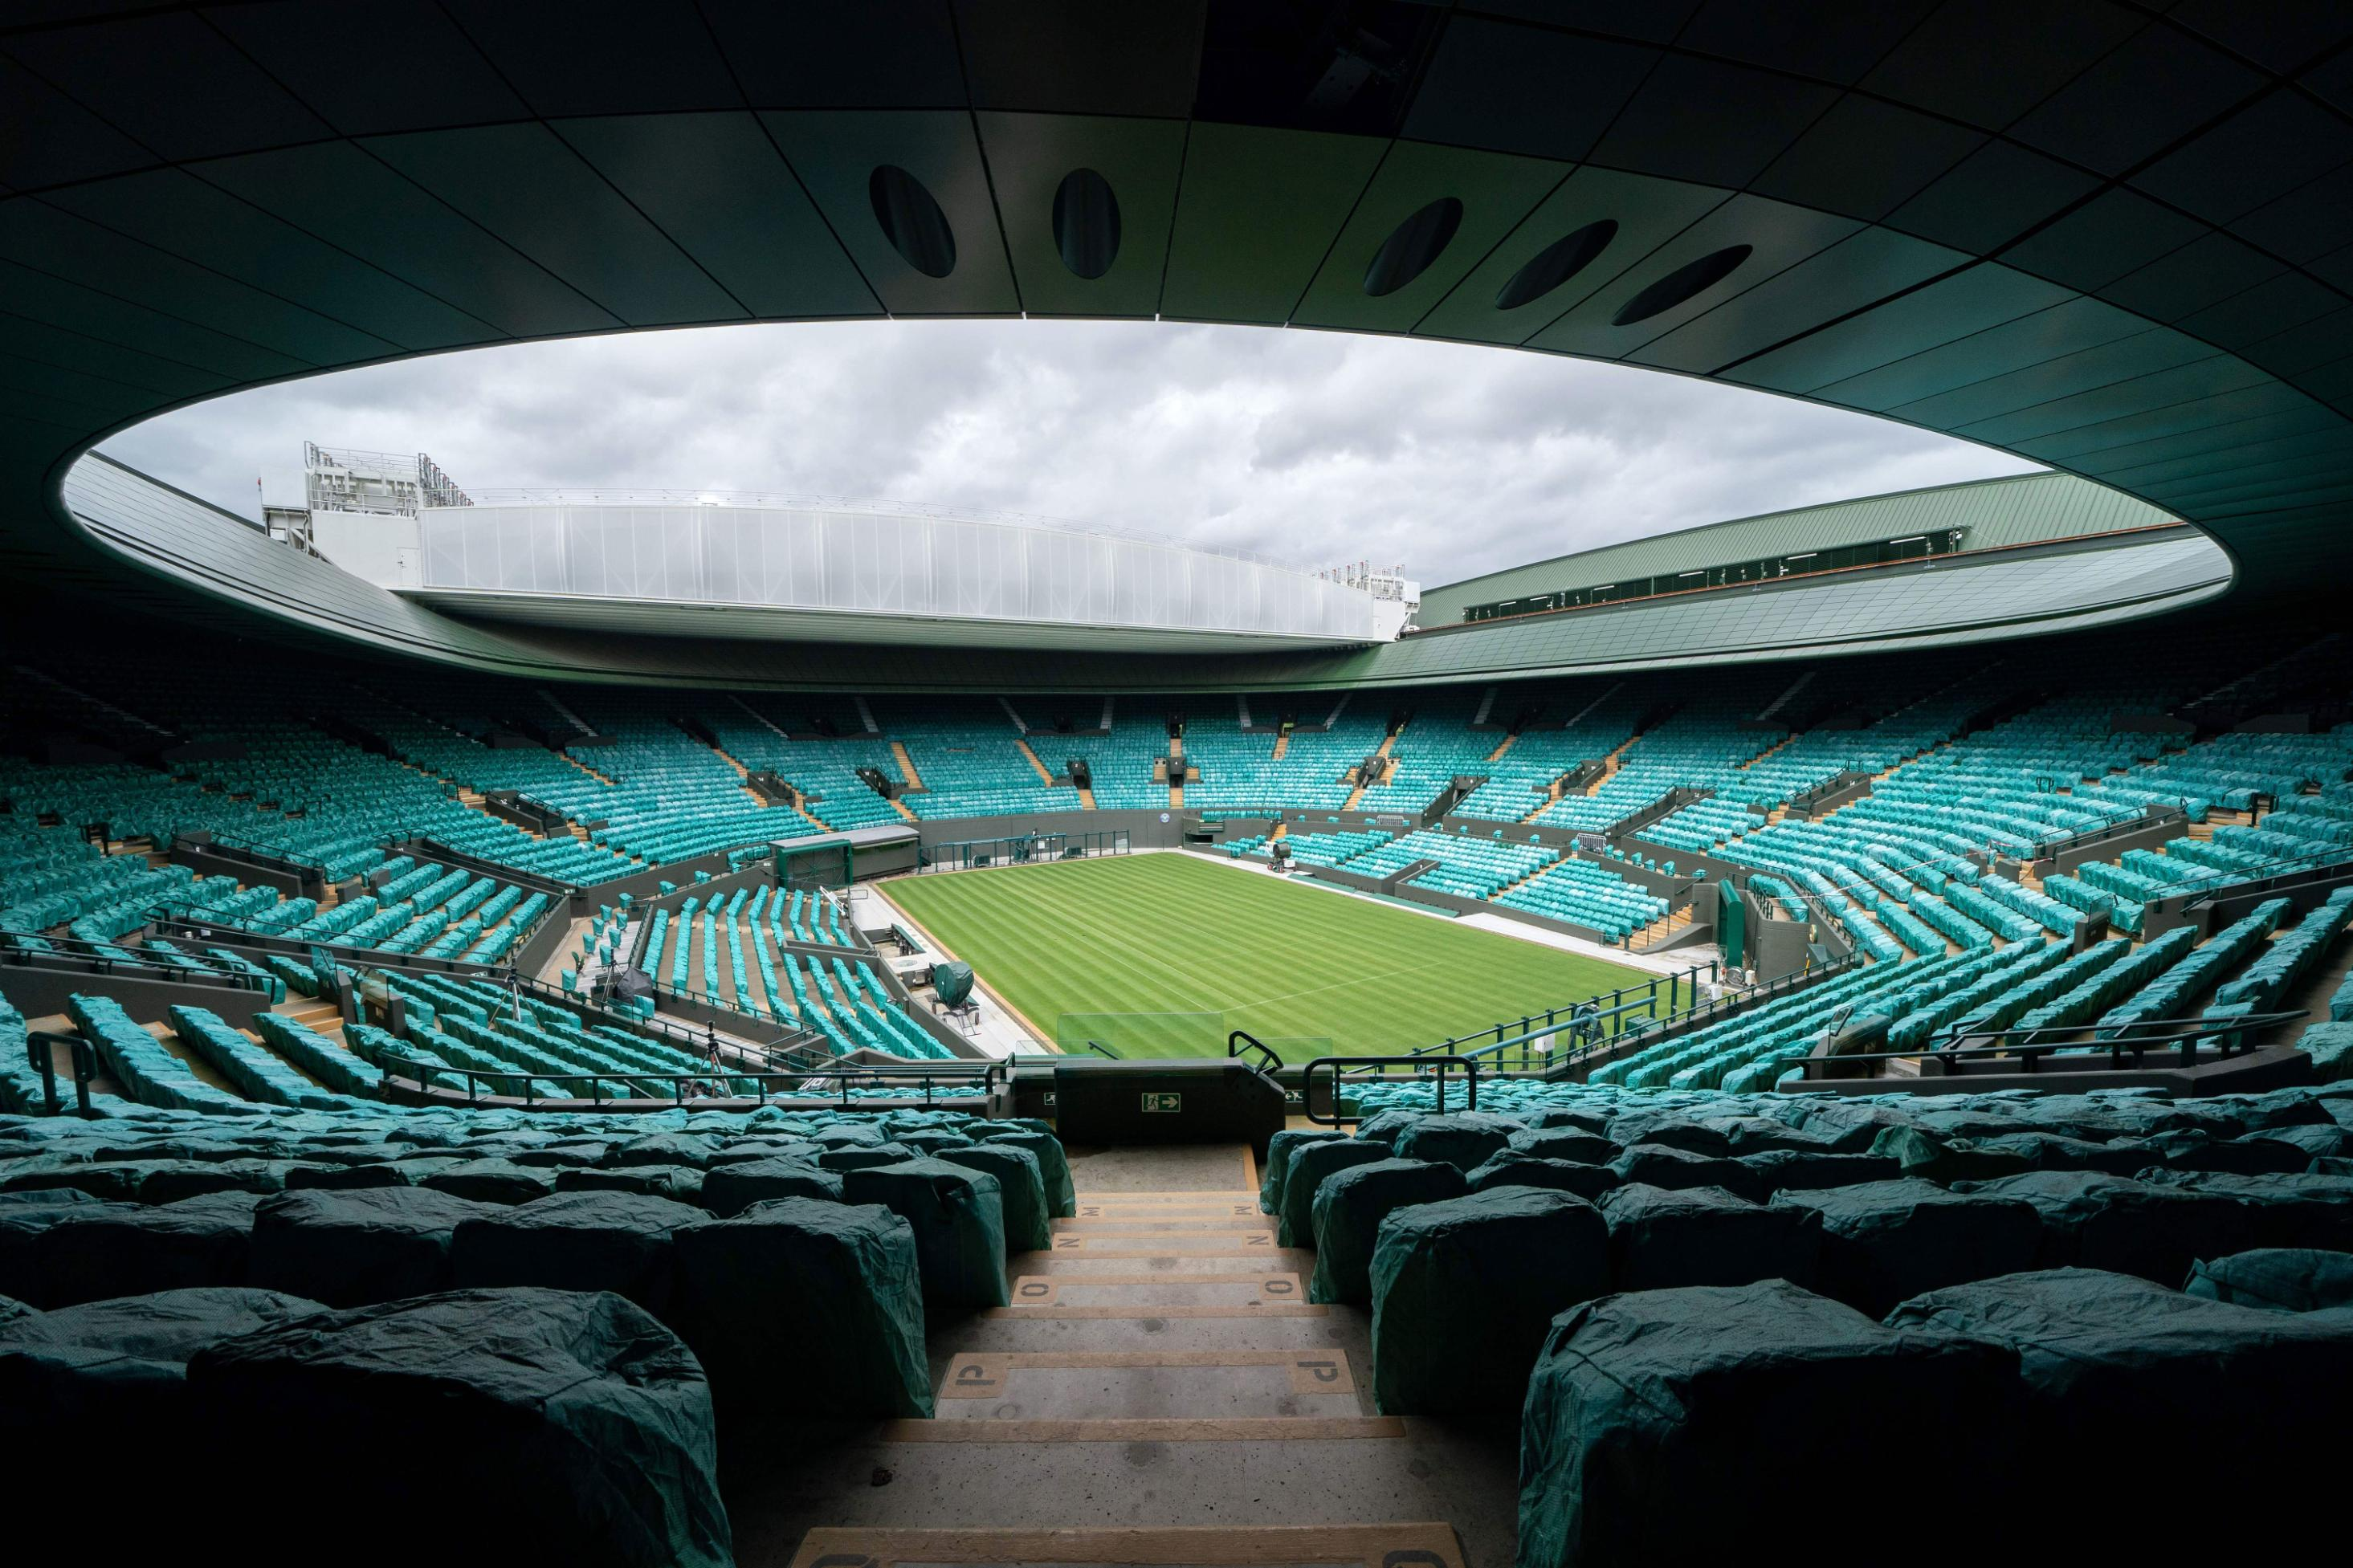 Wimbledon organizers cut prize money by 5%, aim for full stadium capacity